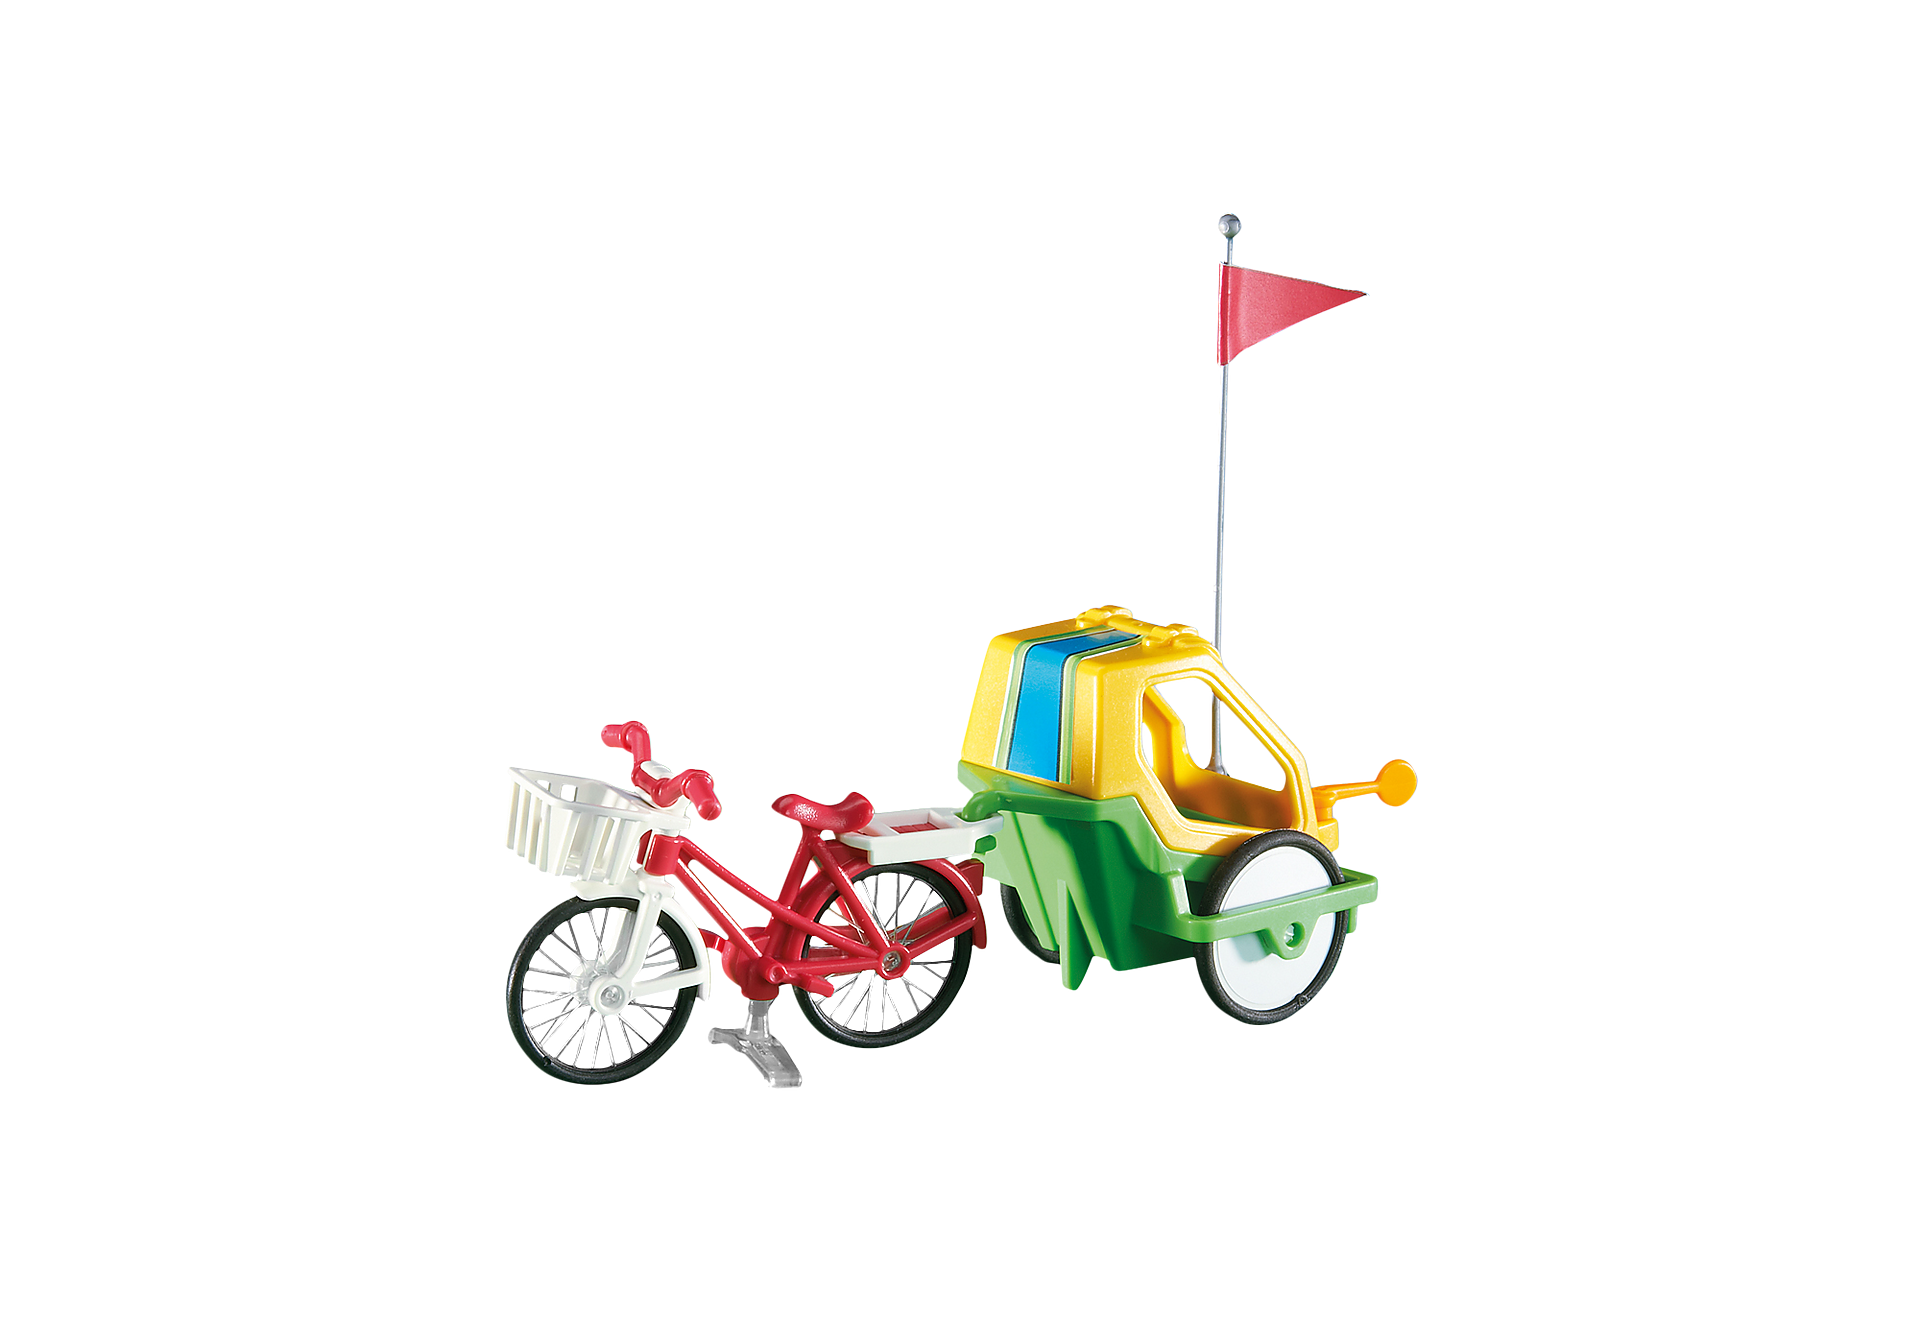 6388 Fahrrad mit Kinderanhänger zoom image1